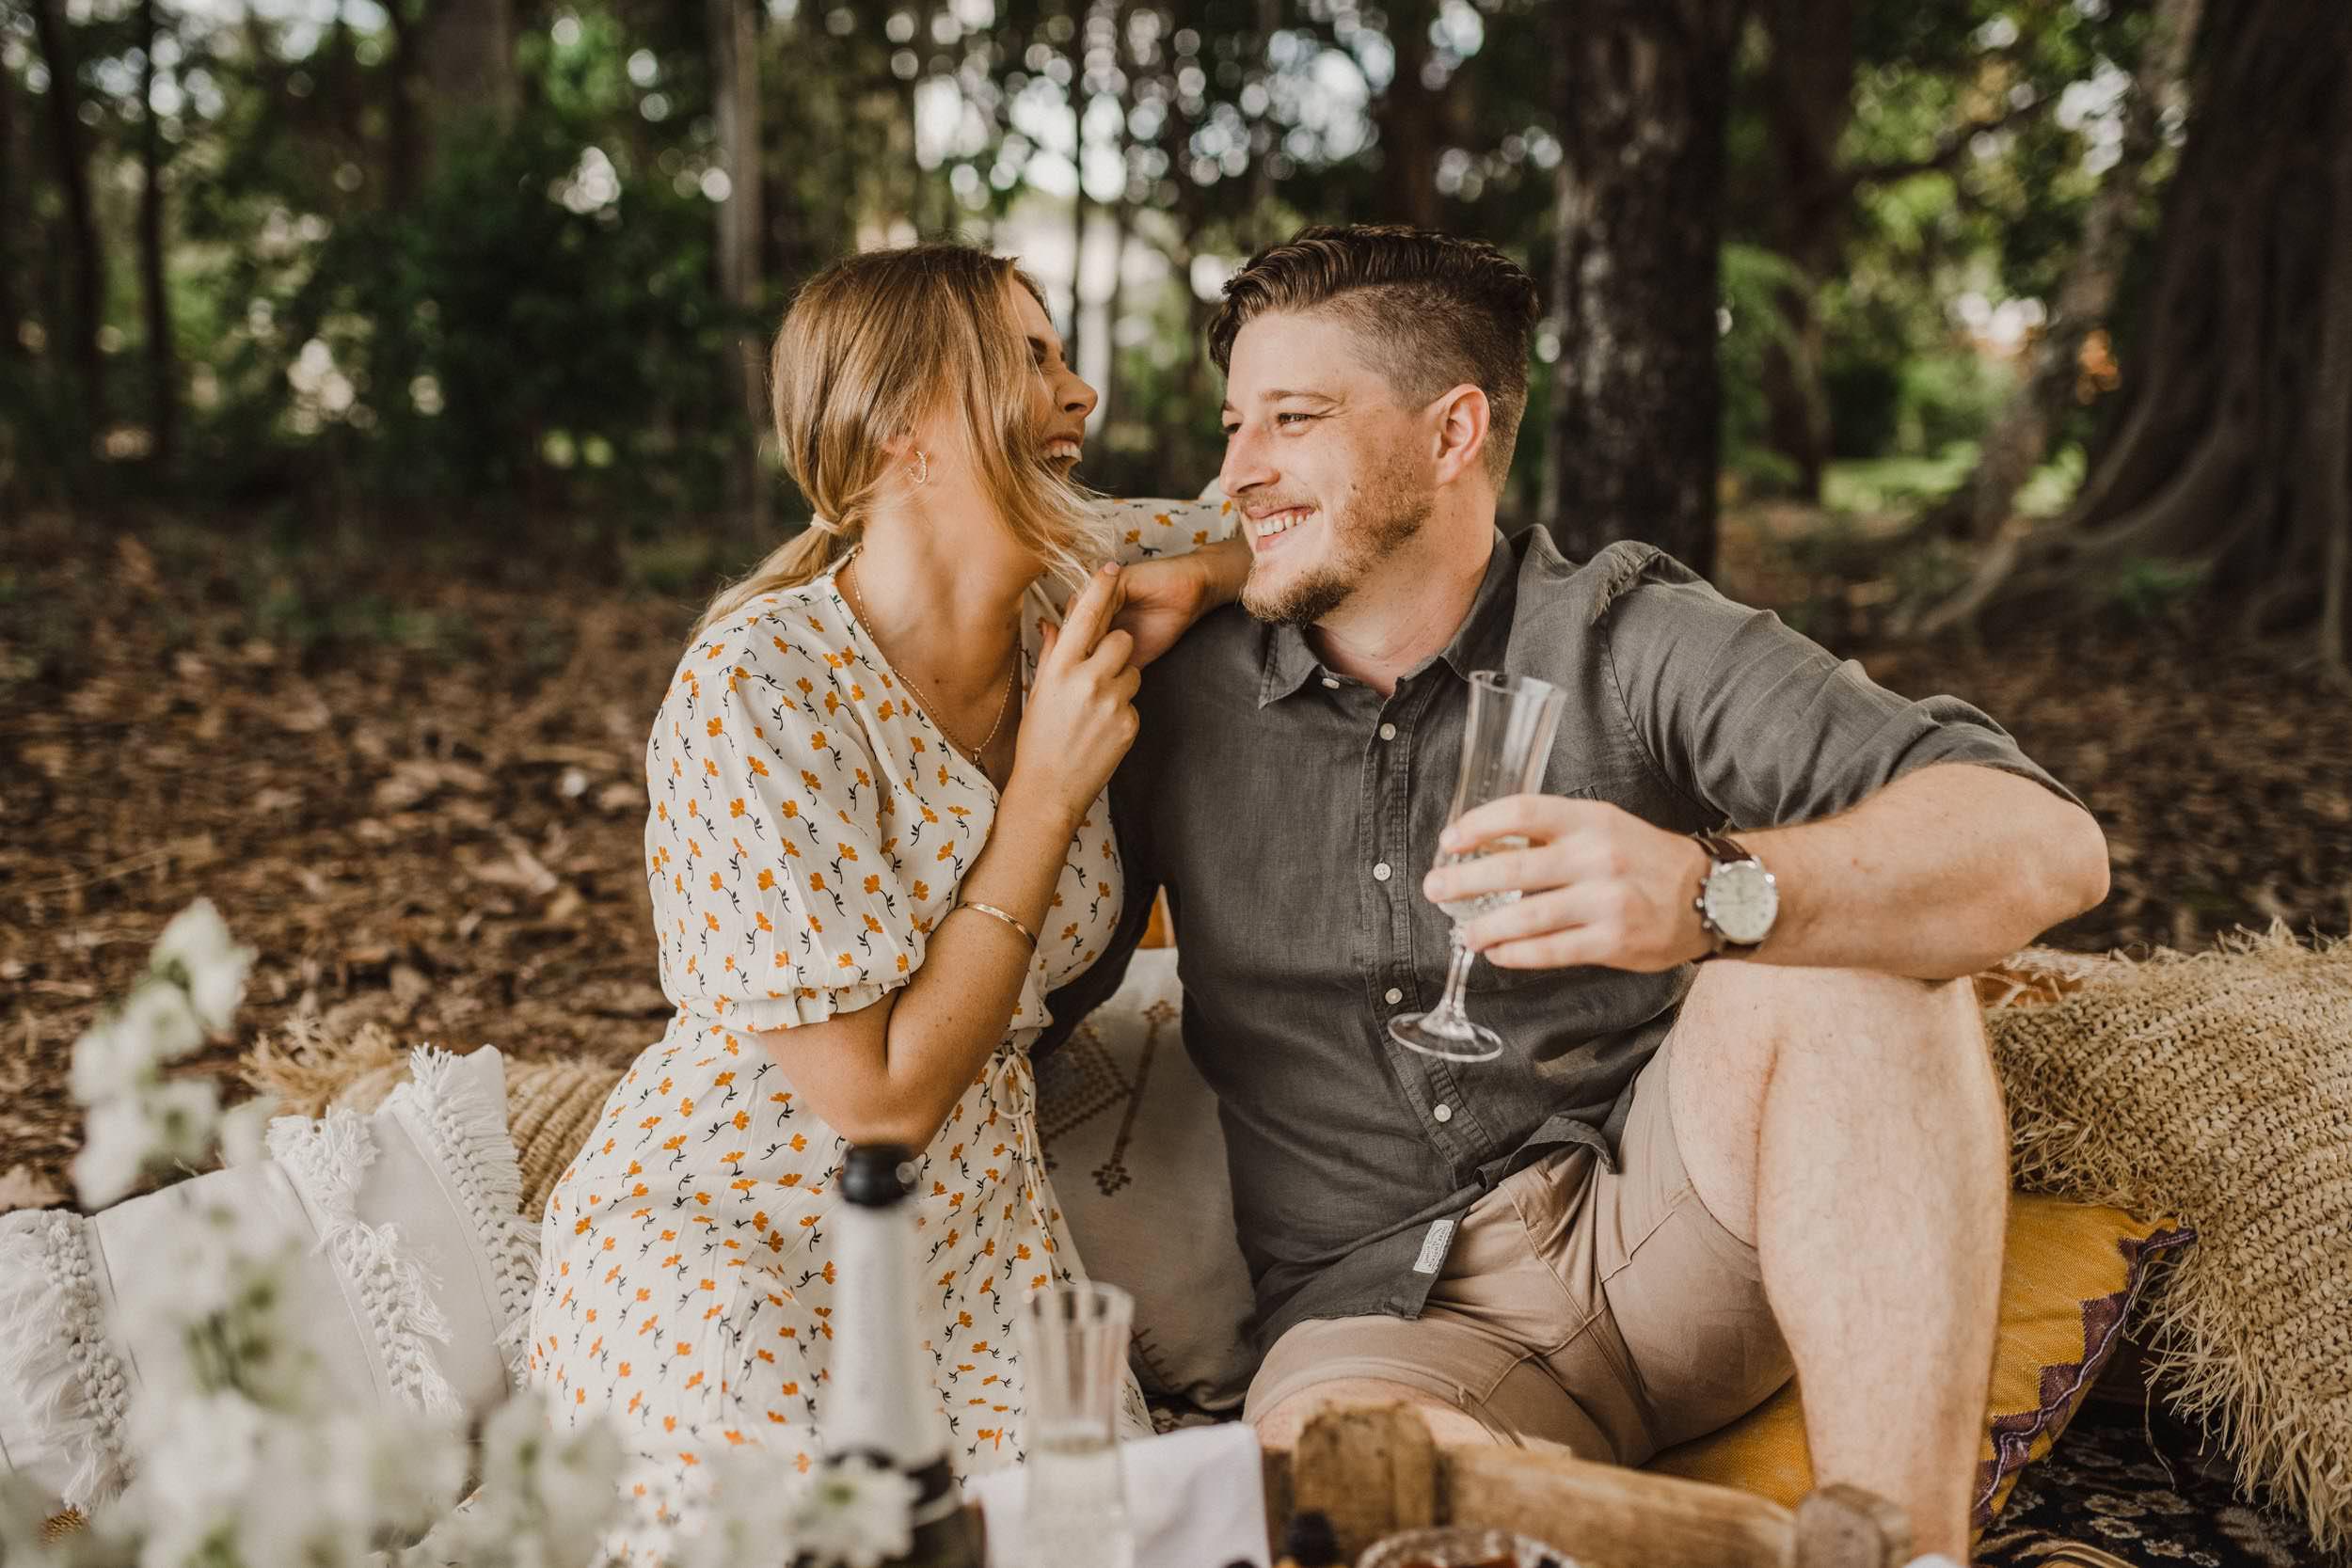 The Raw Photographer - Cairns Wedding Photographer - Beach Engagement Shoot - Candid Picnic-6.jpg